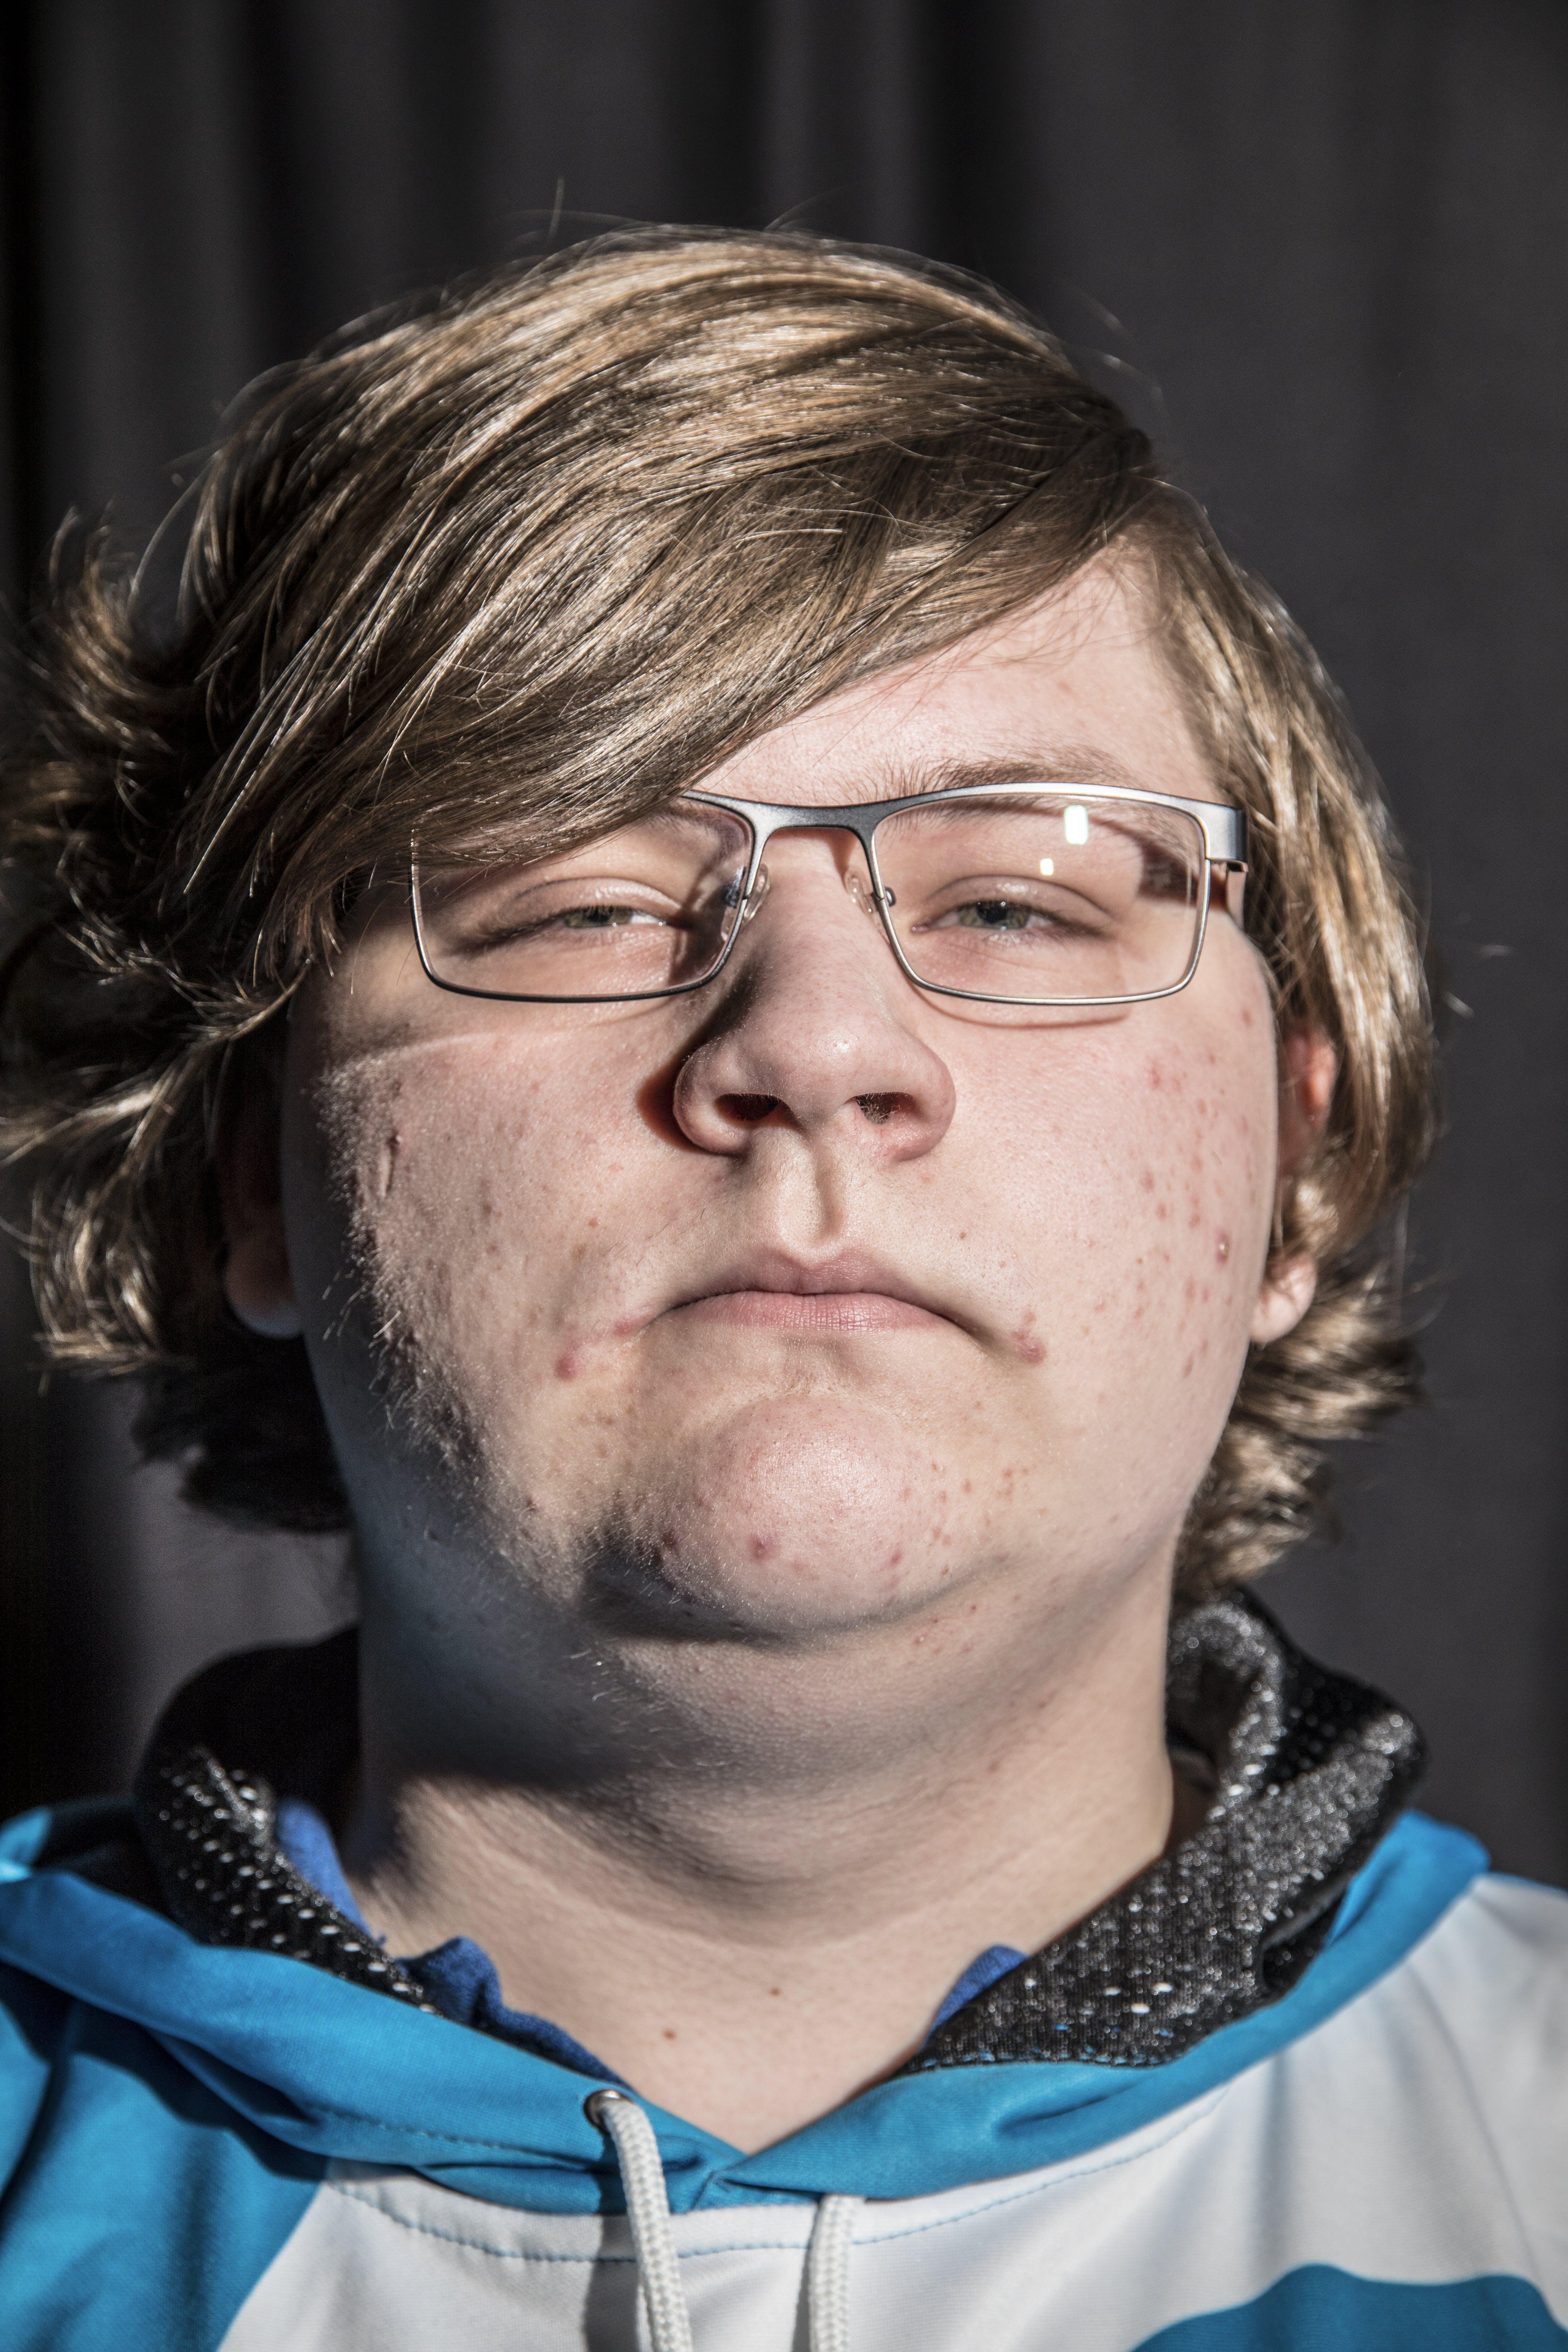 Matthew Thornton, 17, New Castle, Delaware. He is William Hamilton's agent.